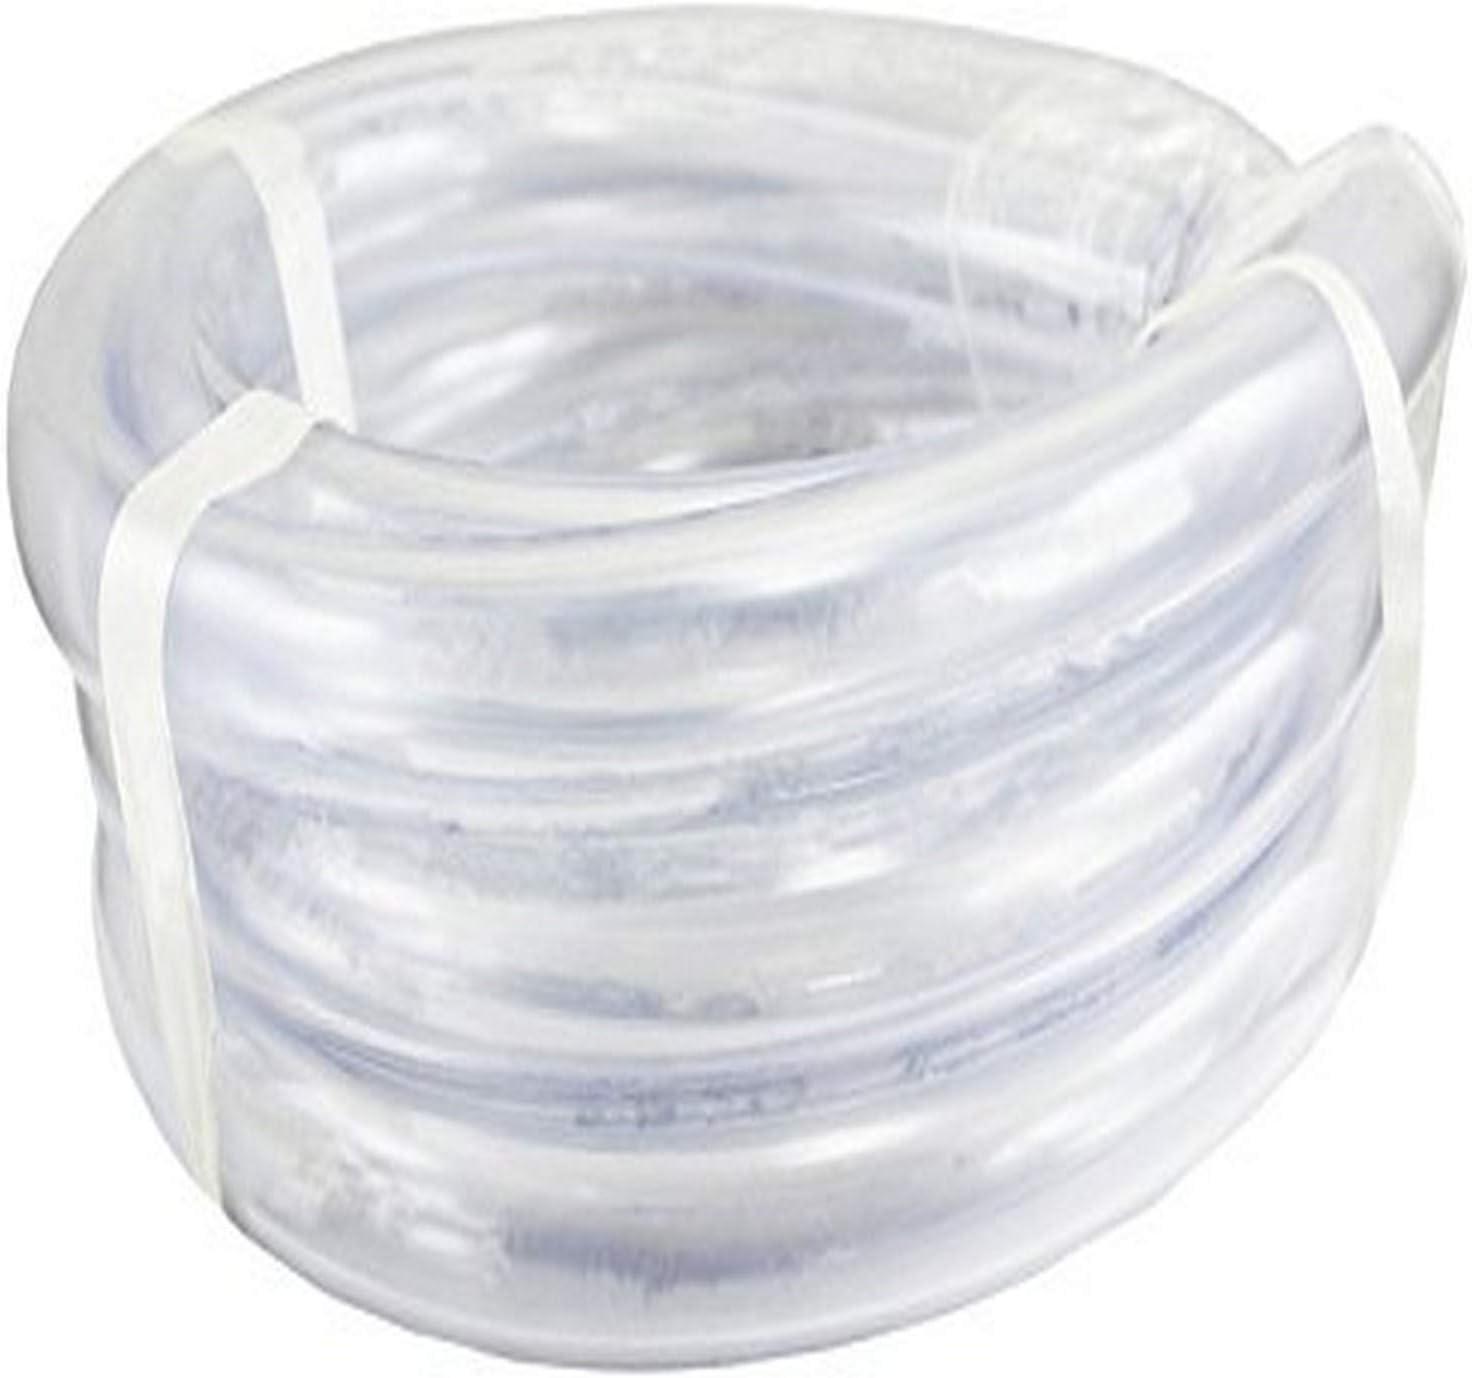 Duda Energy LPpvc125-010ft 10' x 1-1/4 ID Low Pressure Clear Flexible PVC Tubing Heavy Duty UV Chemical Resistant Vinyl Hose